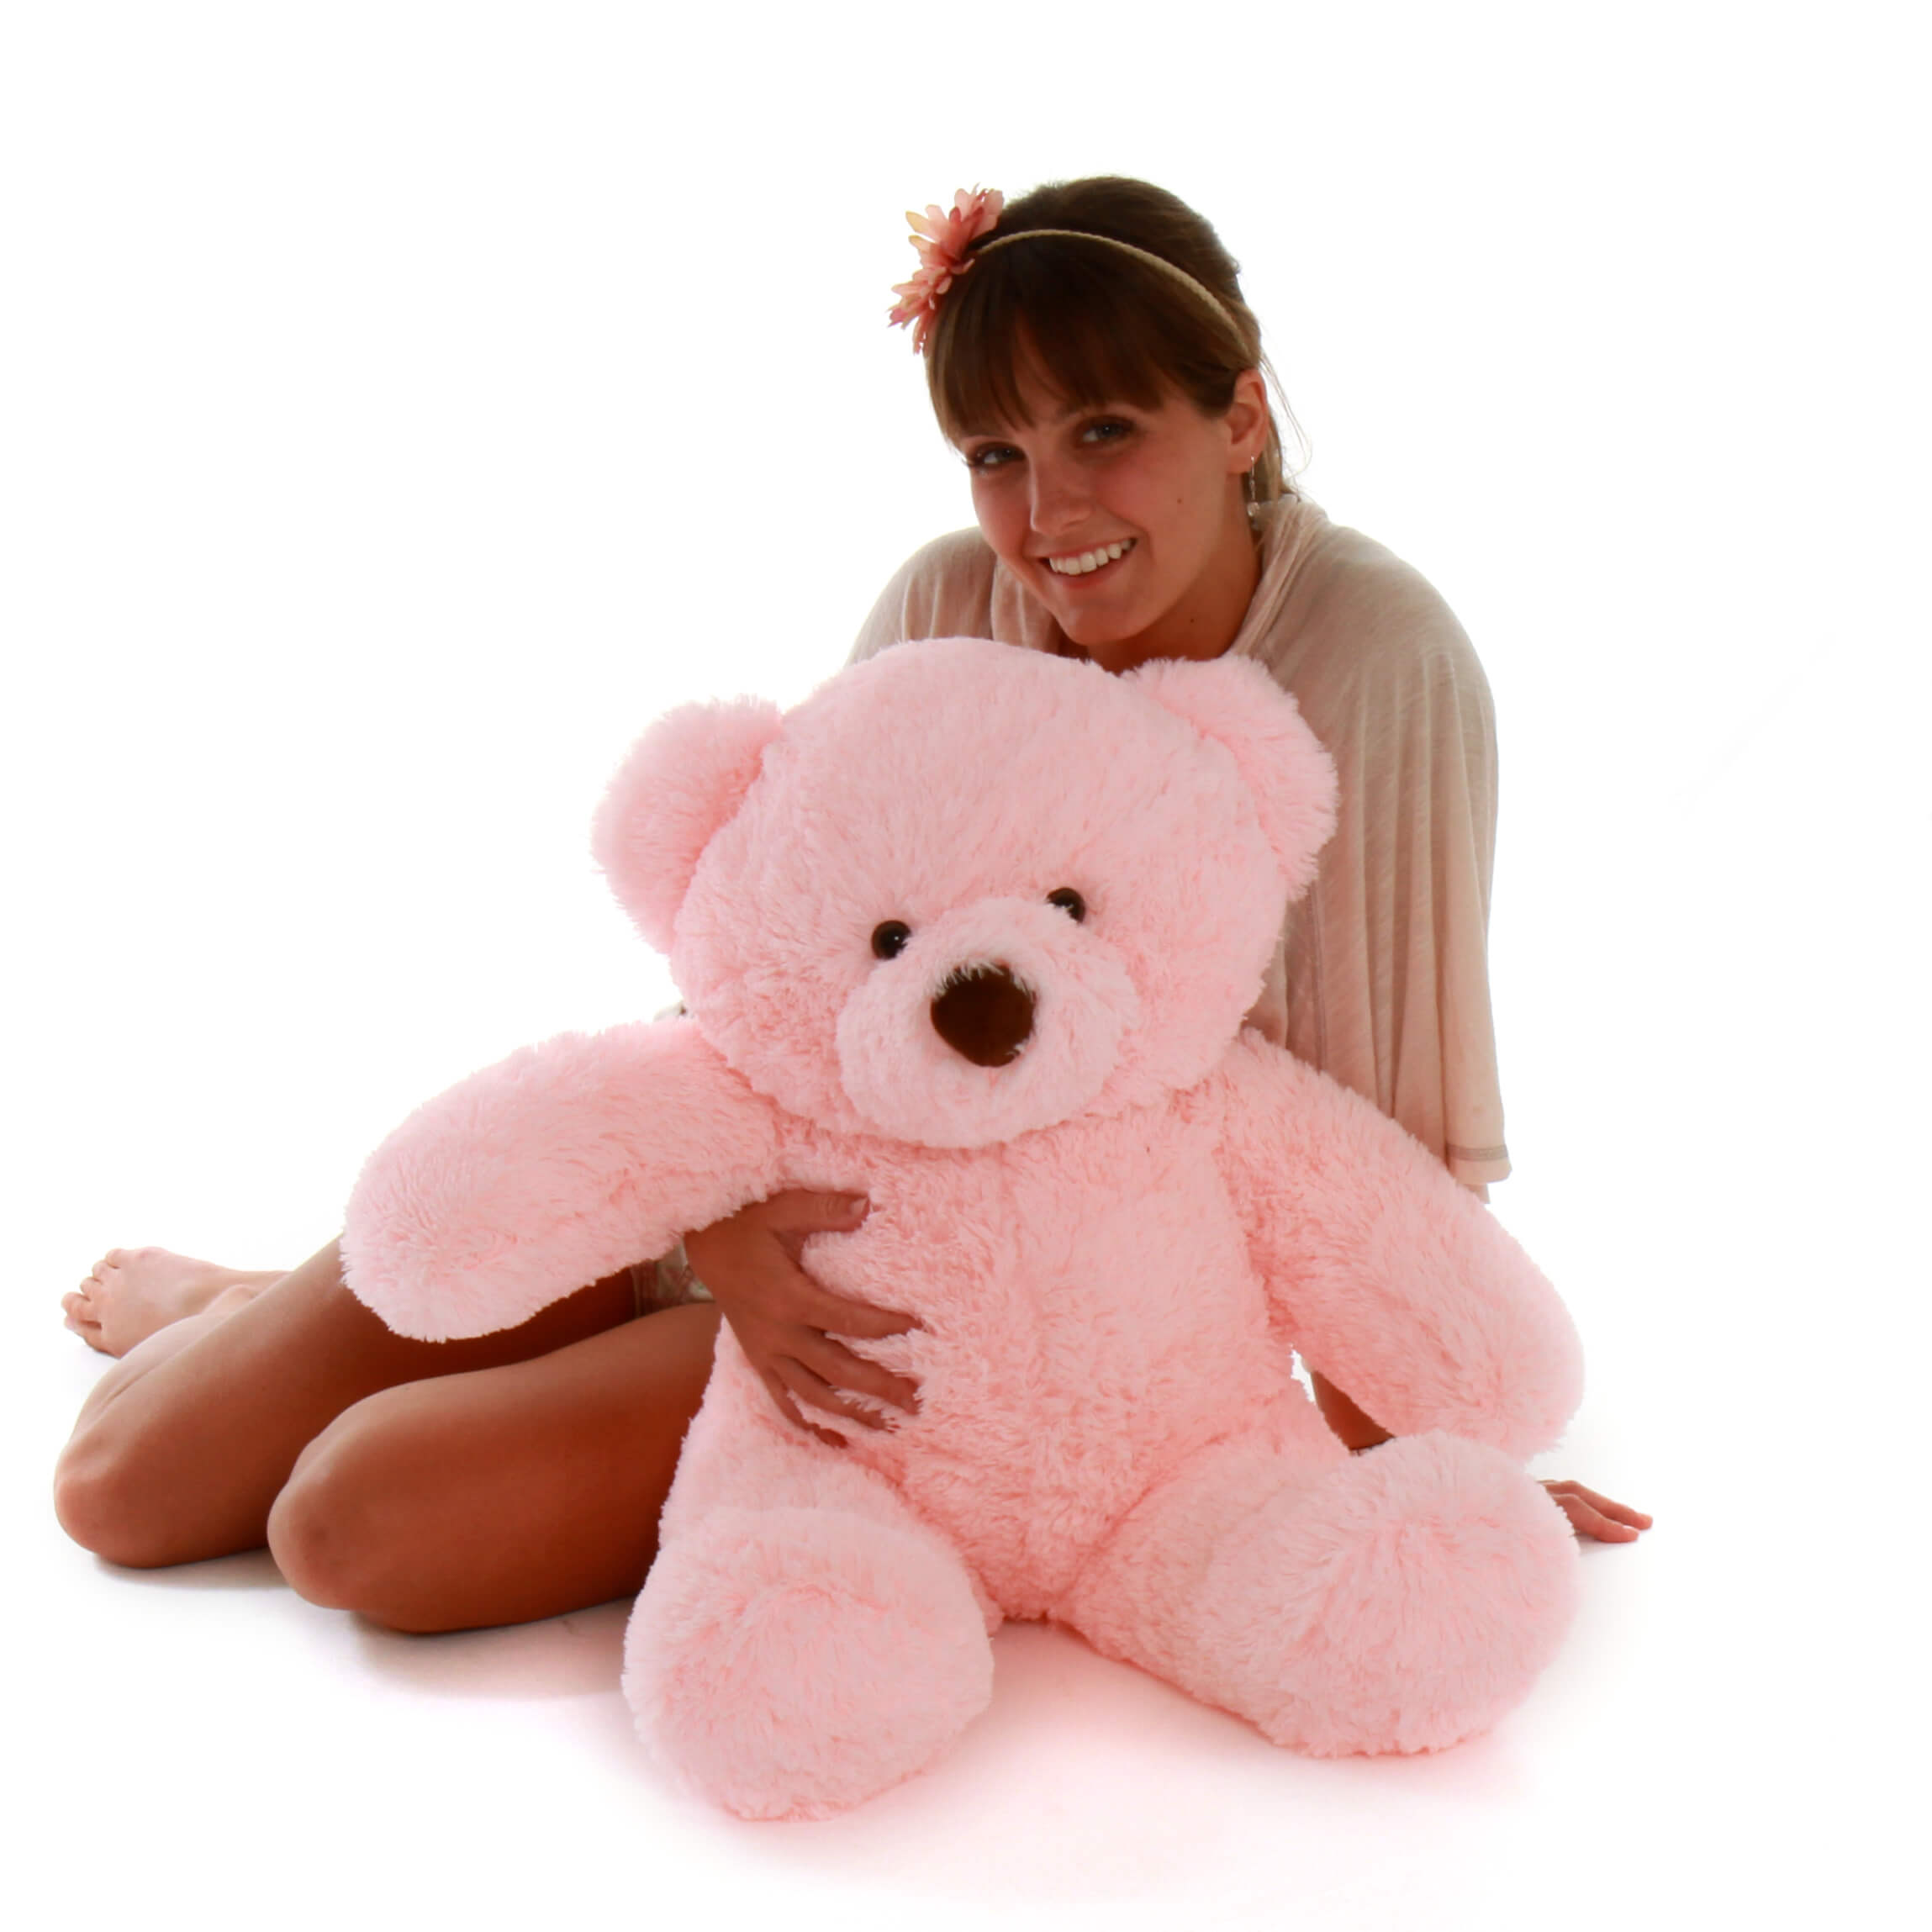 gigi-chubs-light-rose-30in-us-made-giant-teddy-super-adorable-1.jpg